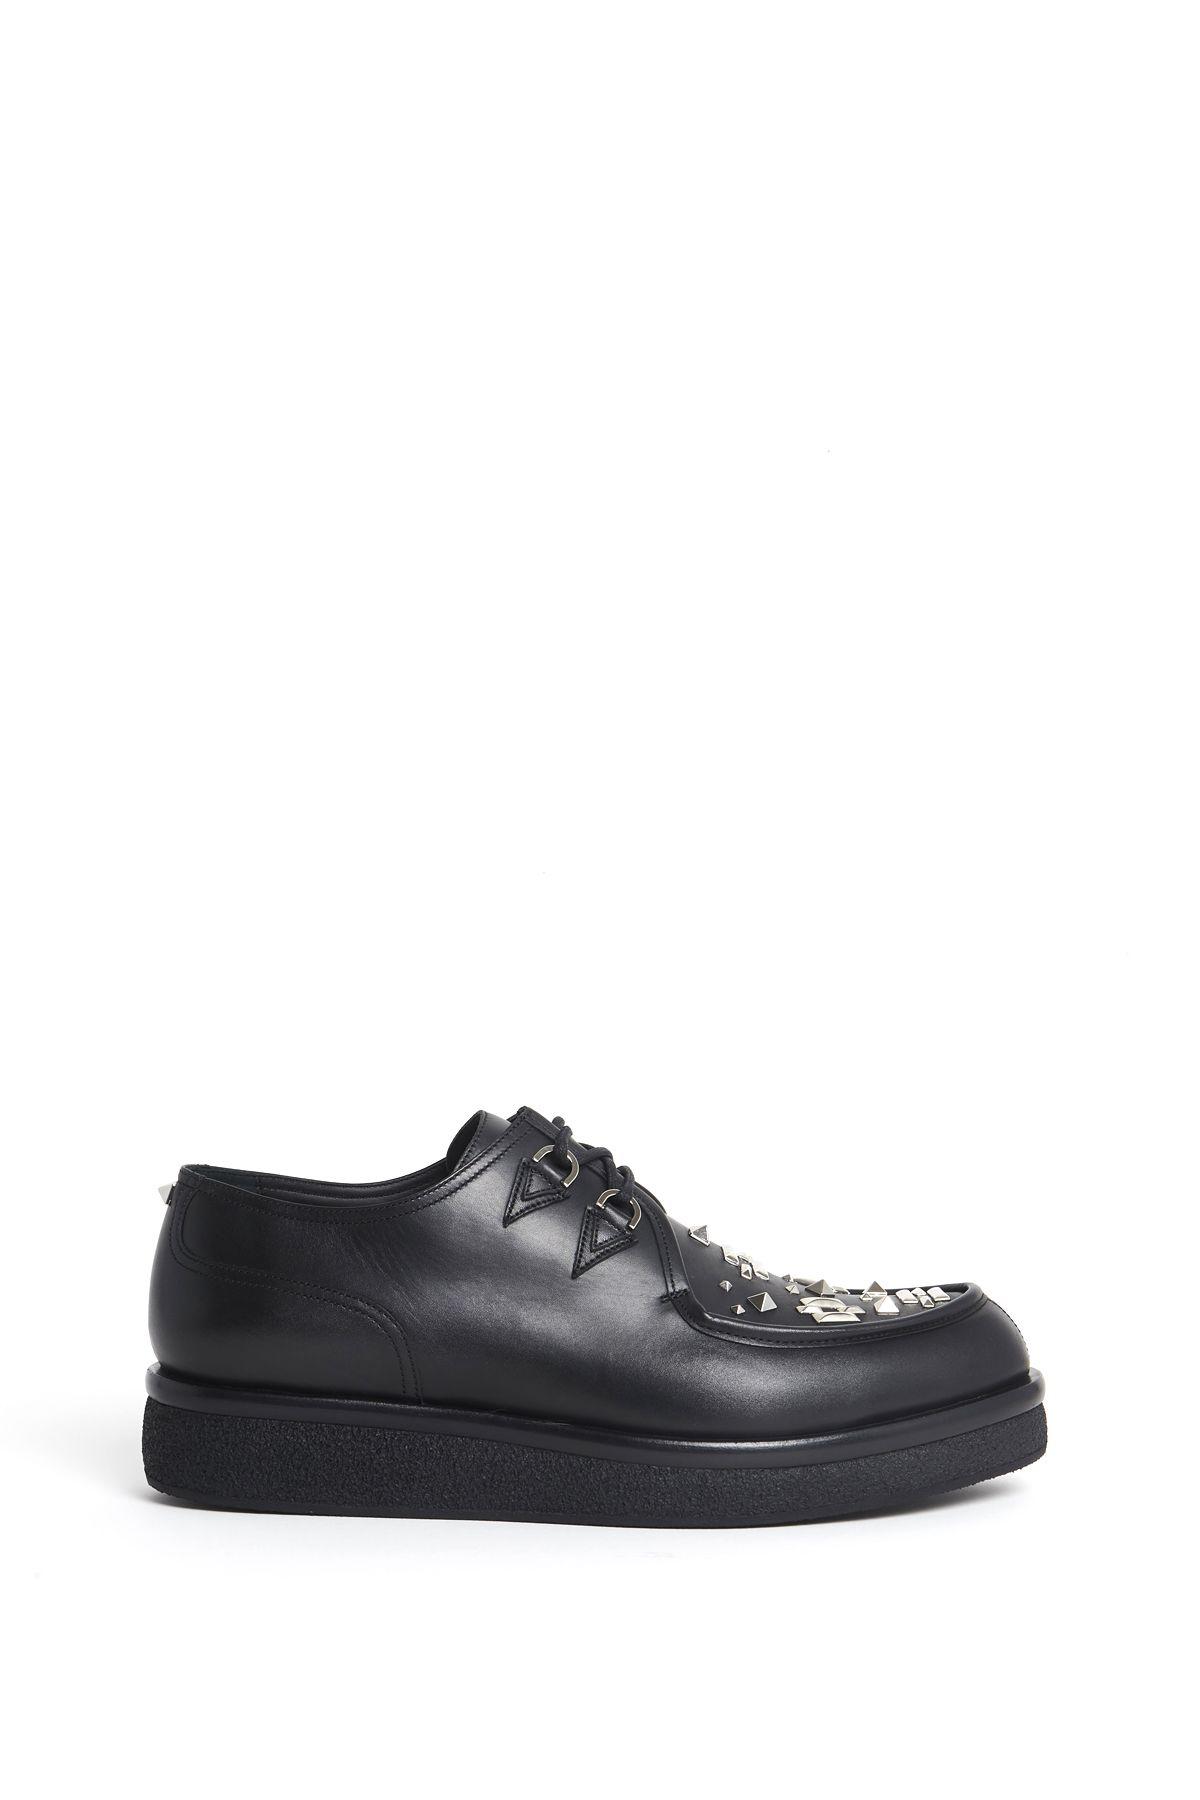 valentino garavani valentino garavani sneakers black men 39 s shoes italist. Black Bedroom Furniture Sets. Home Design Ideas